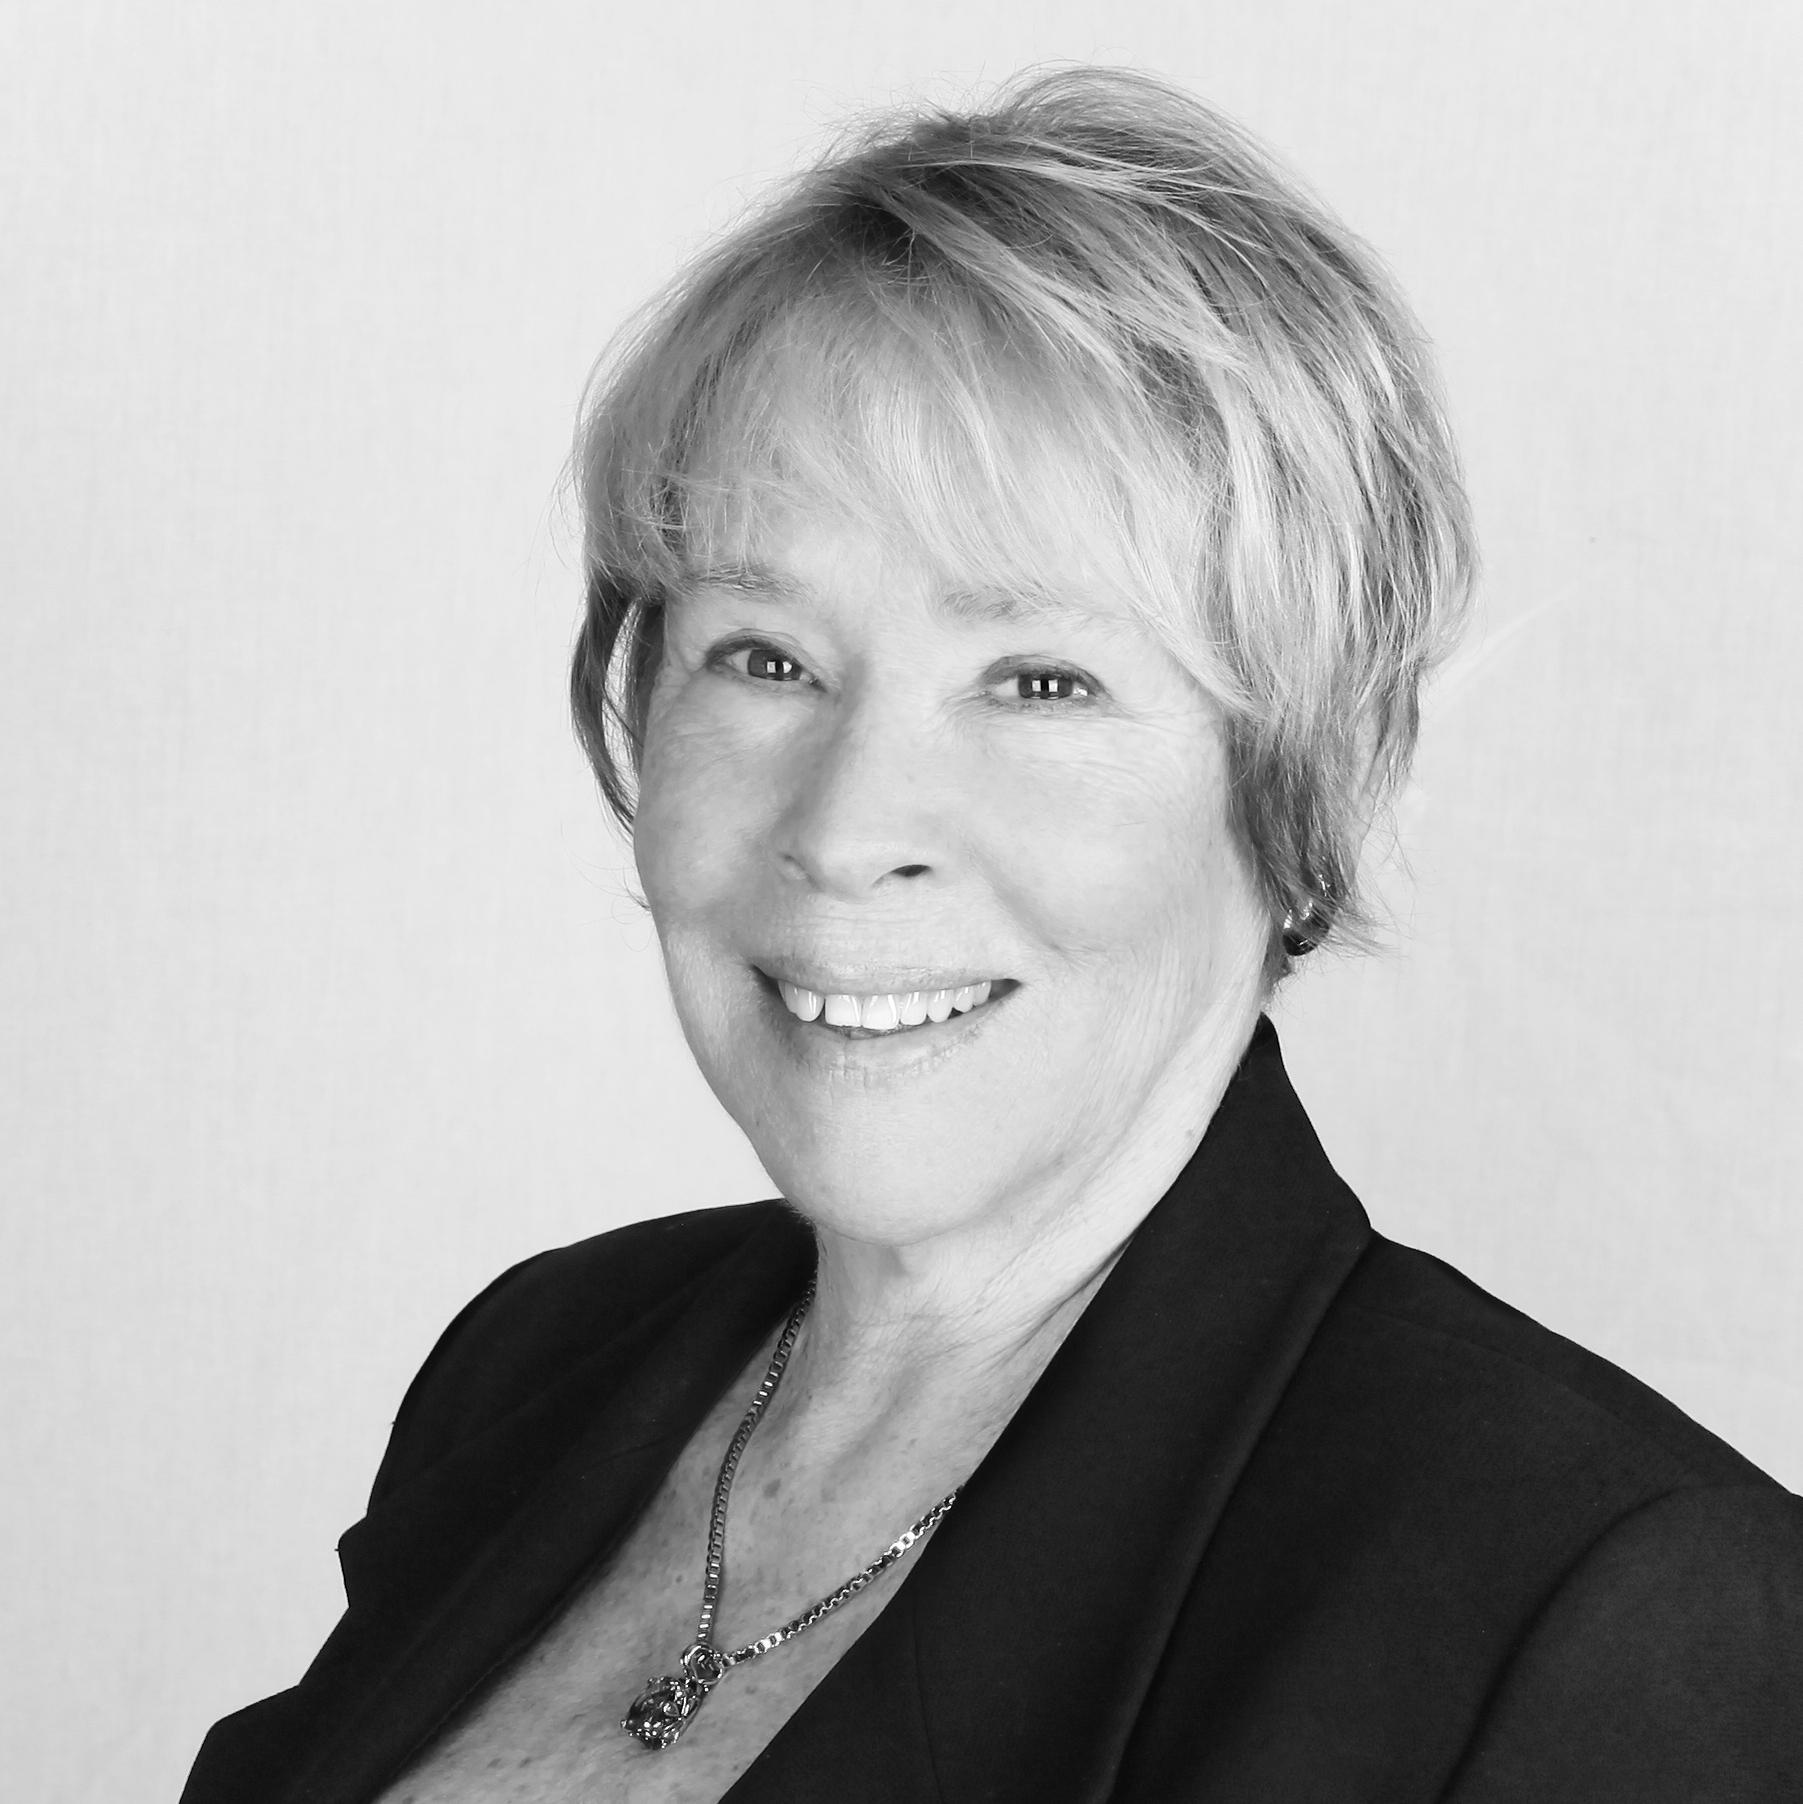 Lynn Copeland - Sales Associate248-221-0962lynncopeland28@yahoo.com